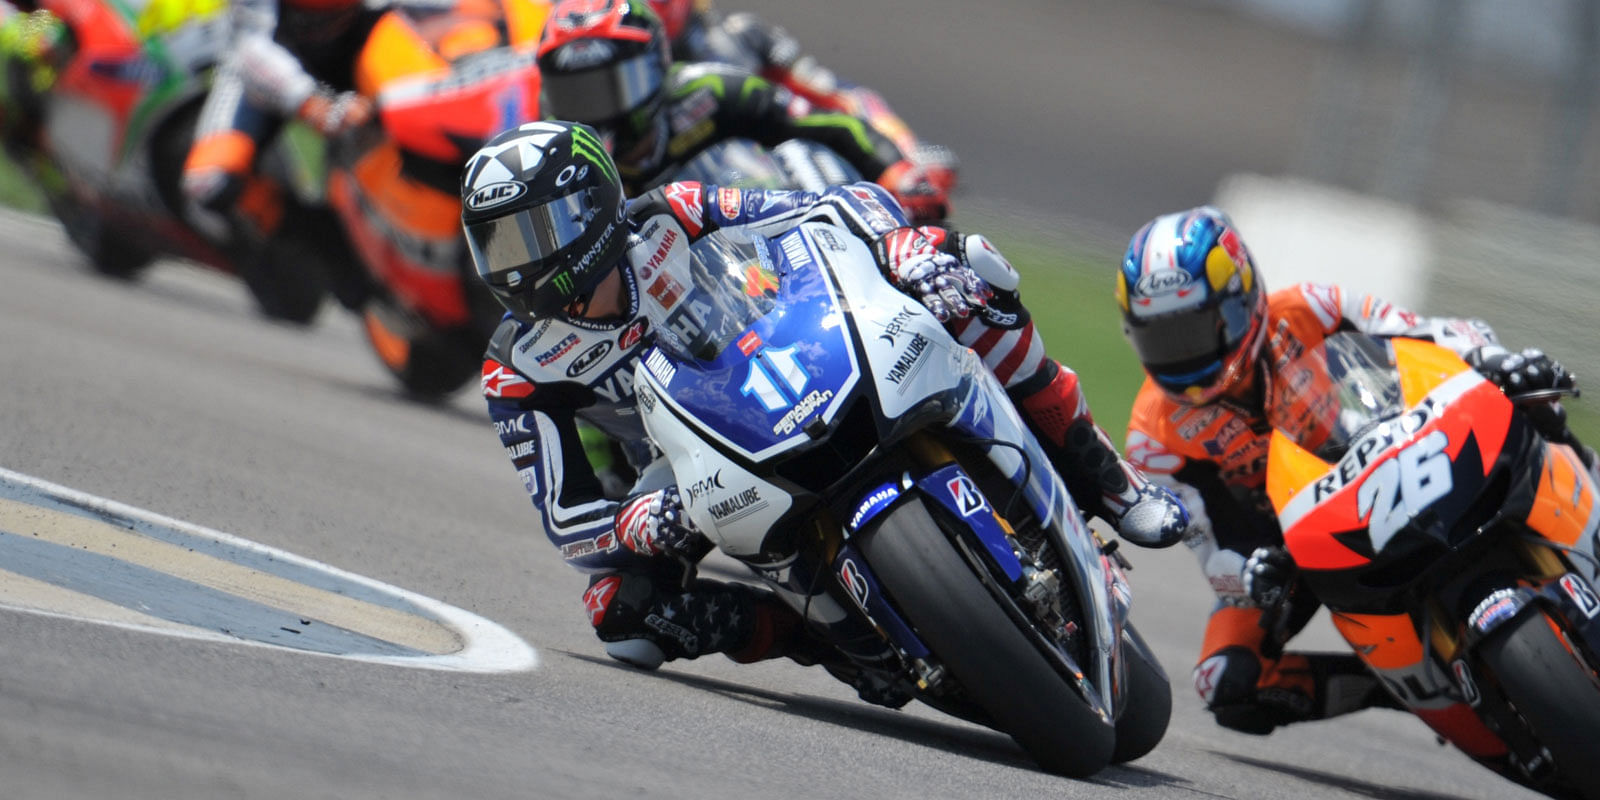 Ten Sports to beam MotoGP live in India